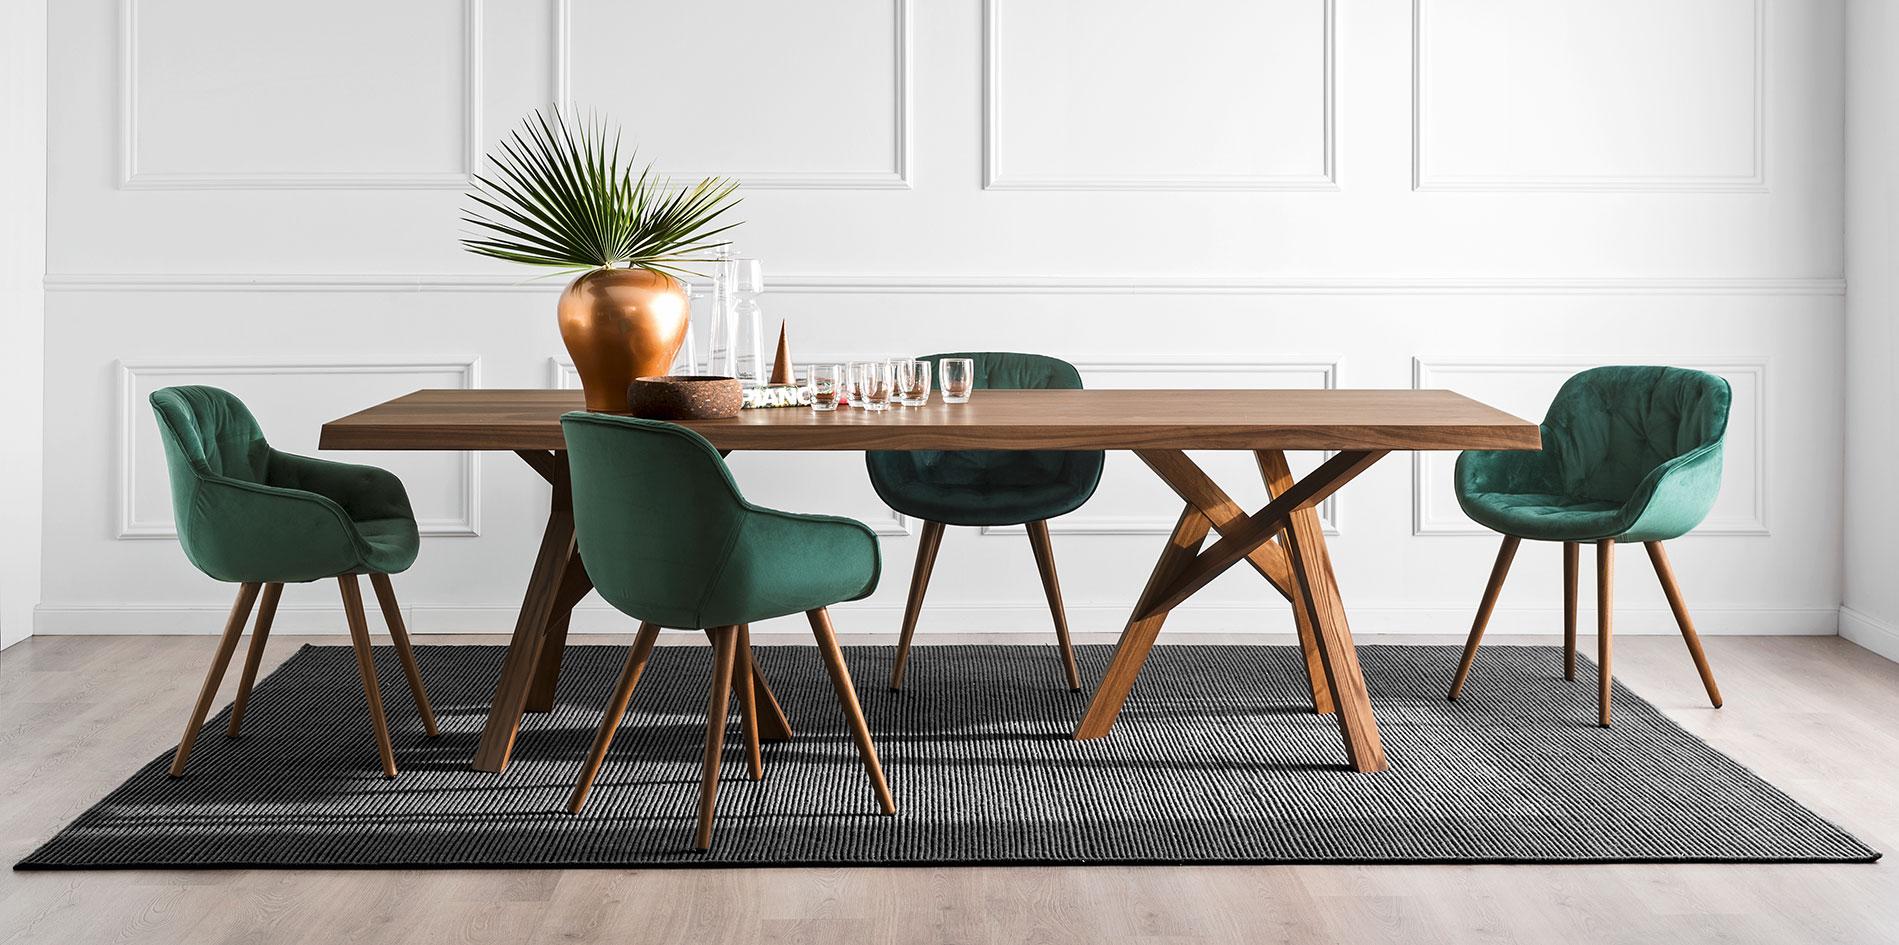 Image Result For Voyager Furniture Interiors Homewares Sofas Tables